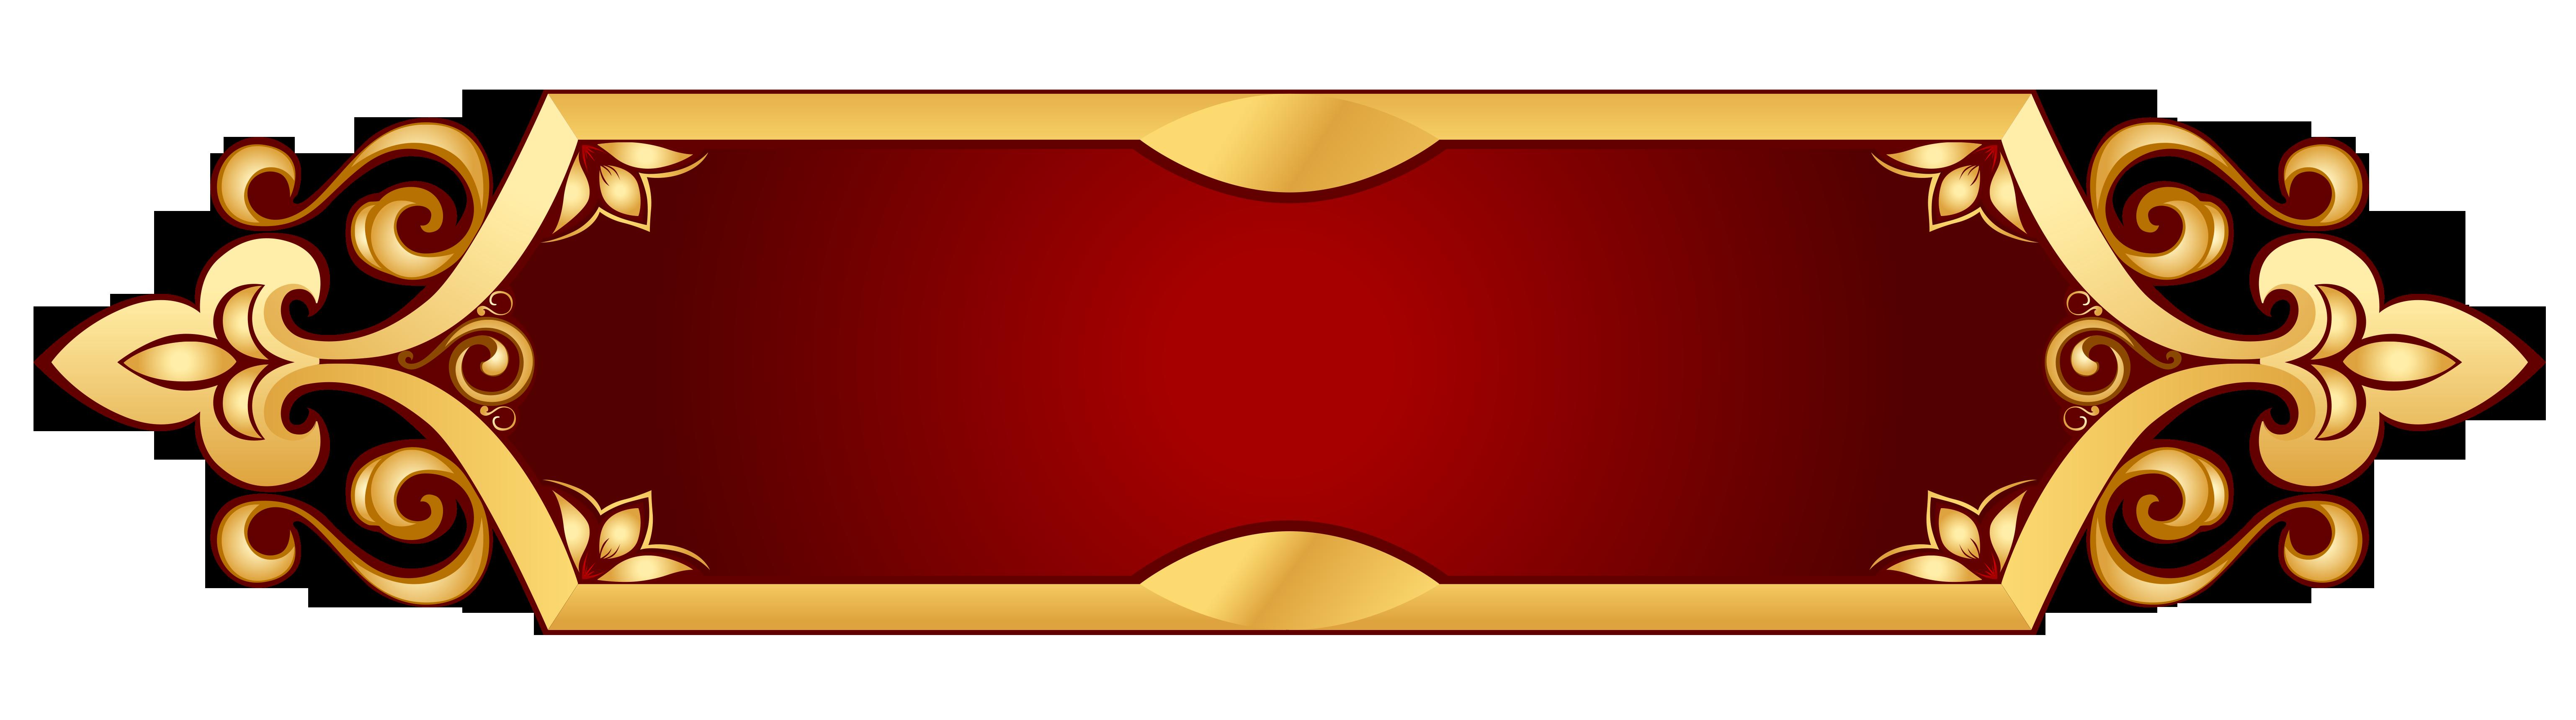 Transparent Banner Clip Art